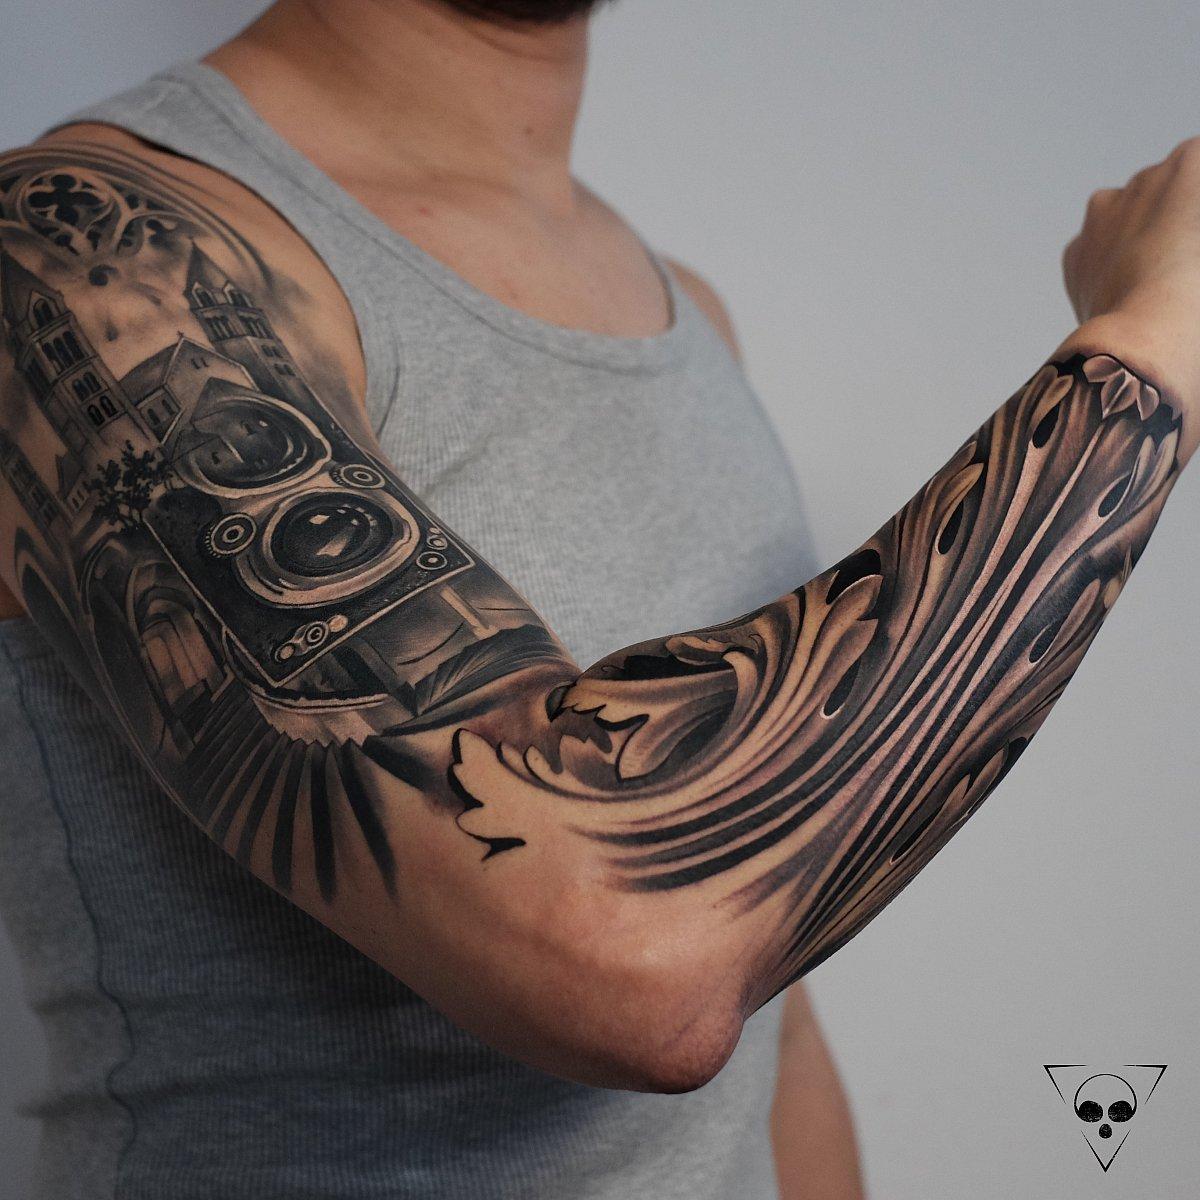 tattooscout die gro e tattoo community. Black Bedroom Furniture Sets. Home Design Ideas